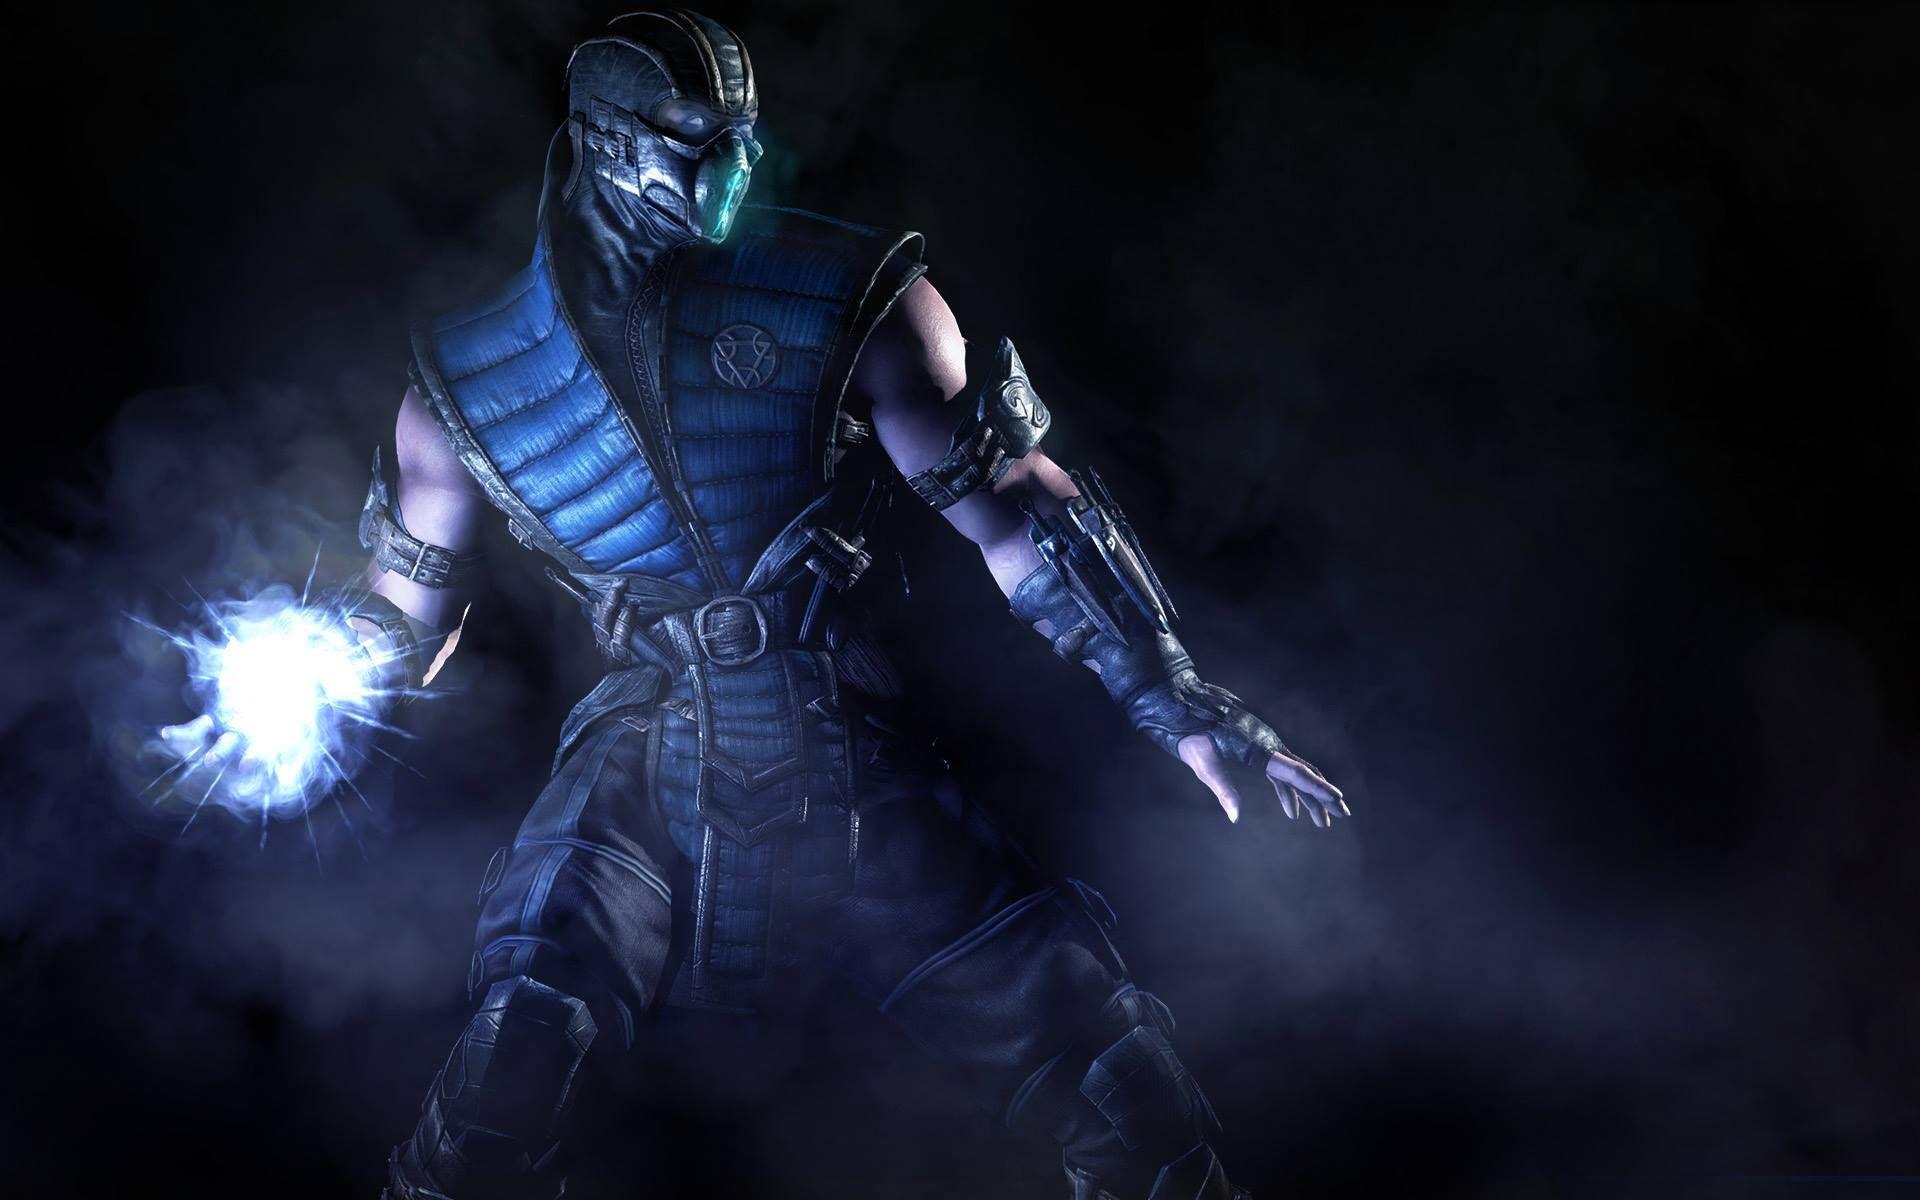 Sub Zero Mortal Kombat X Wallpaper With Images Sub Zero Mortal